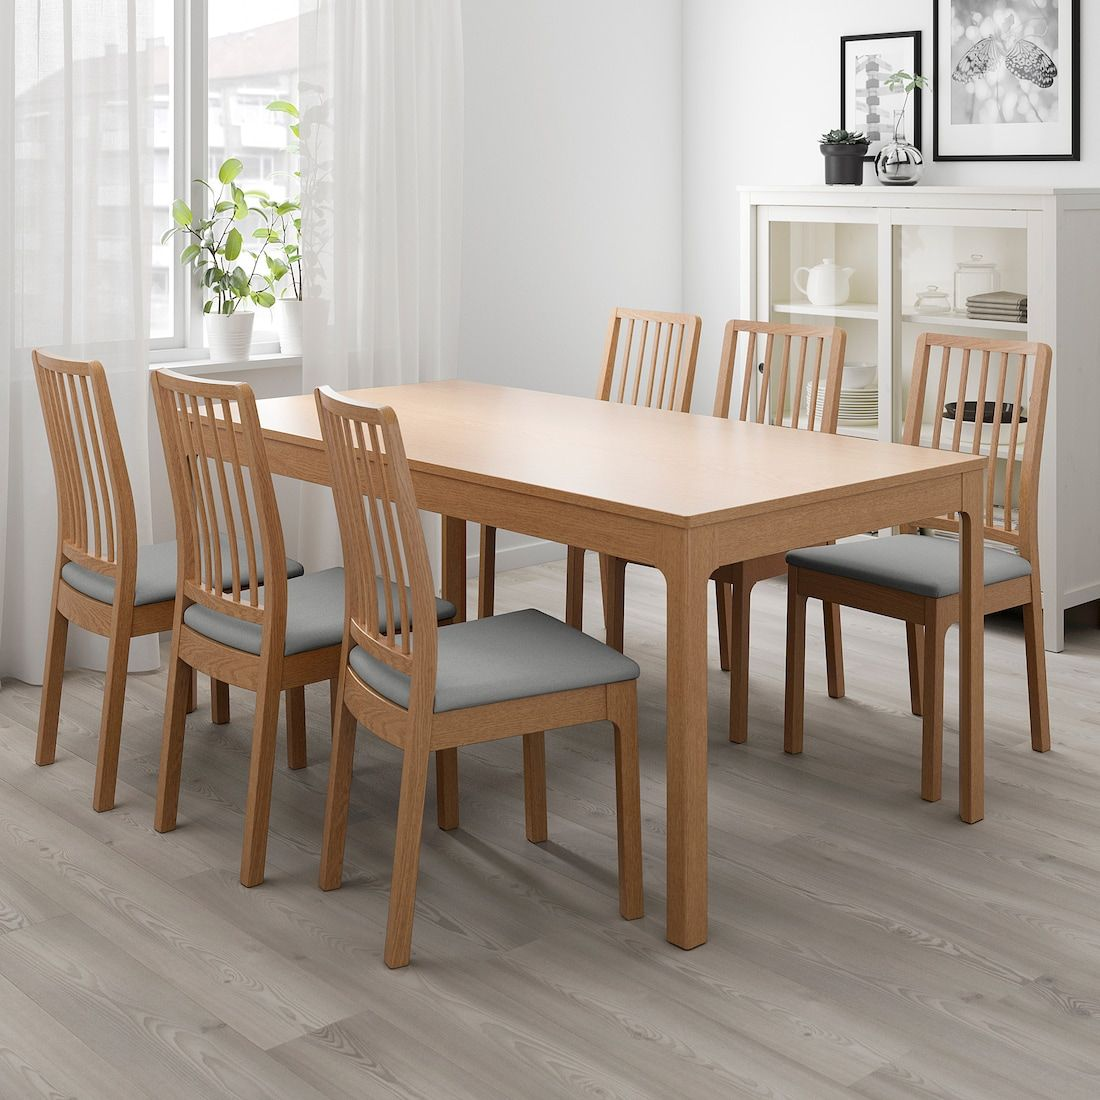 Ekedalen Table Extensible Chene 180 240x90 Cm Ikea In 2020 Eetkamersets Eetkamertafel Hout Eetkamertafel